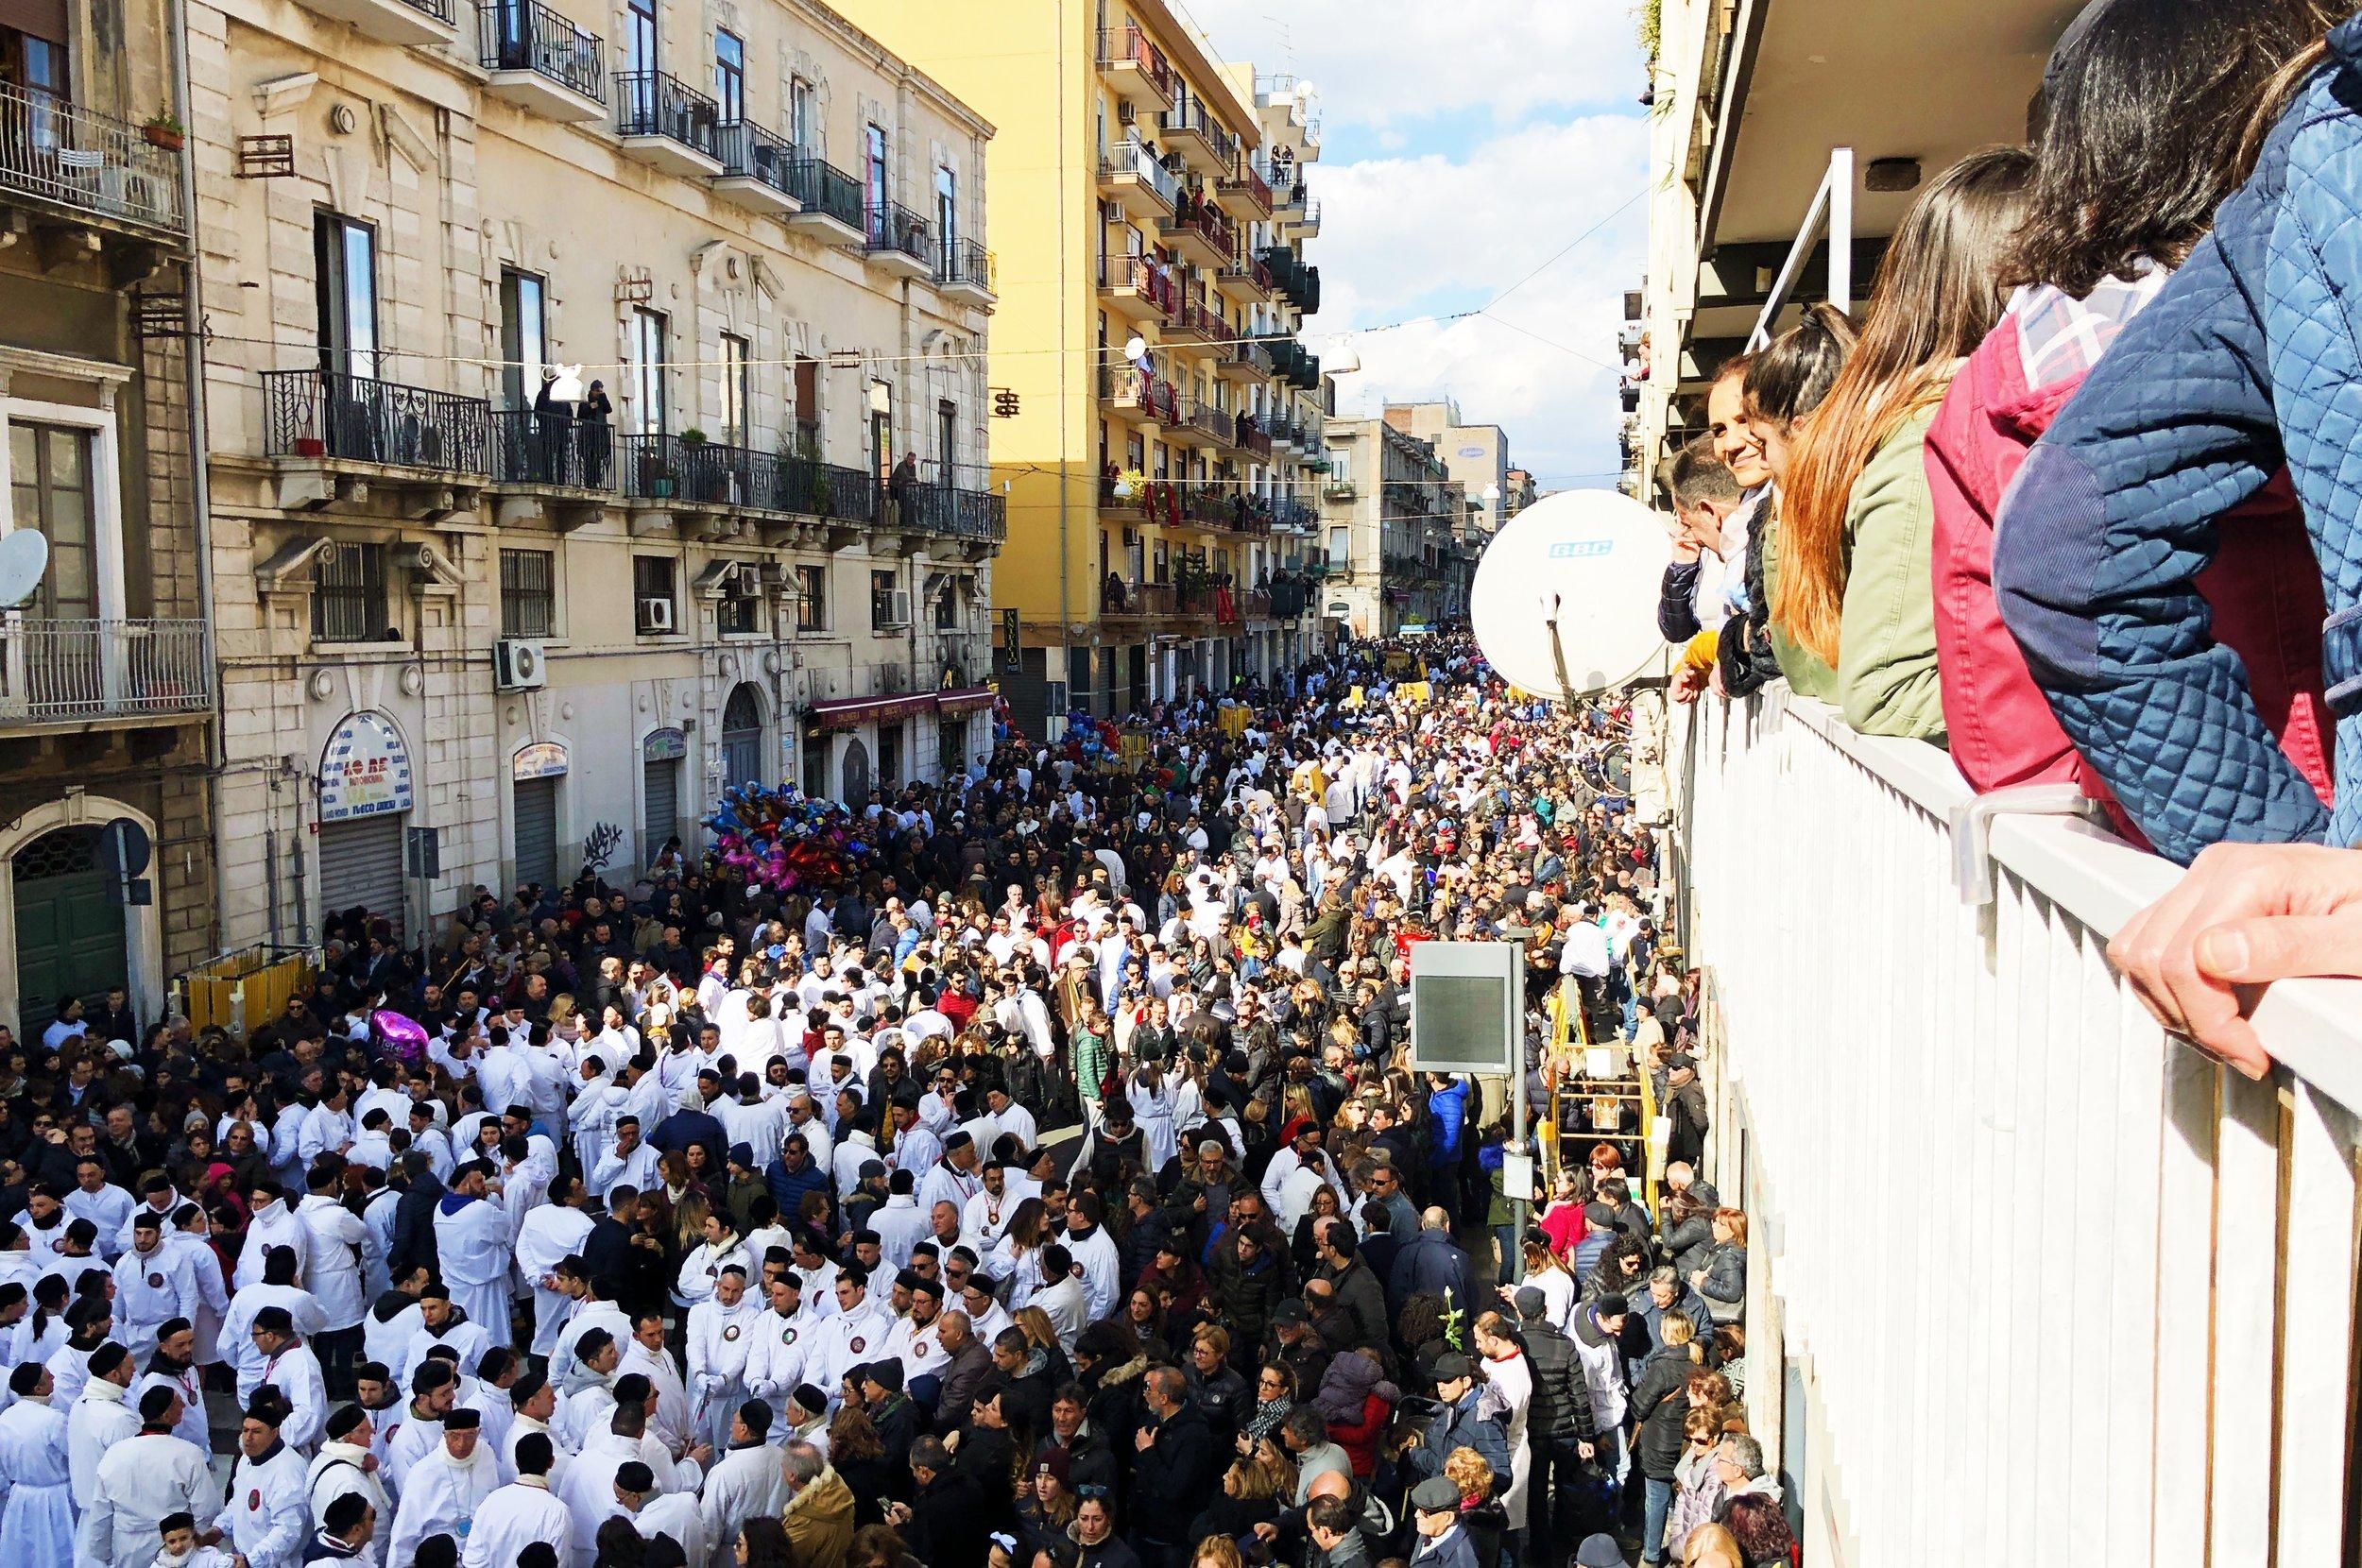 The streets of Catania during the Festa di Sant'Agata